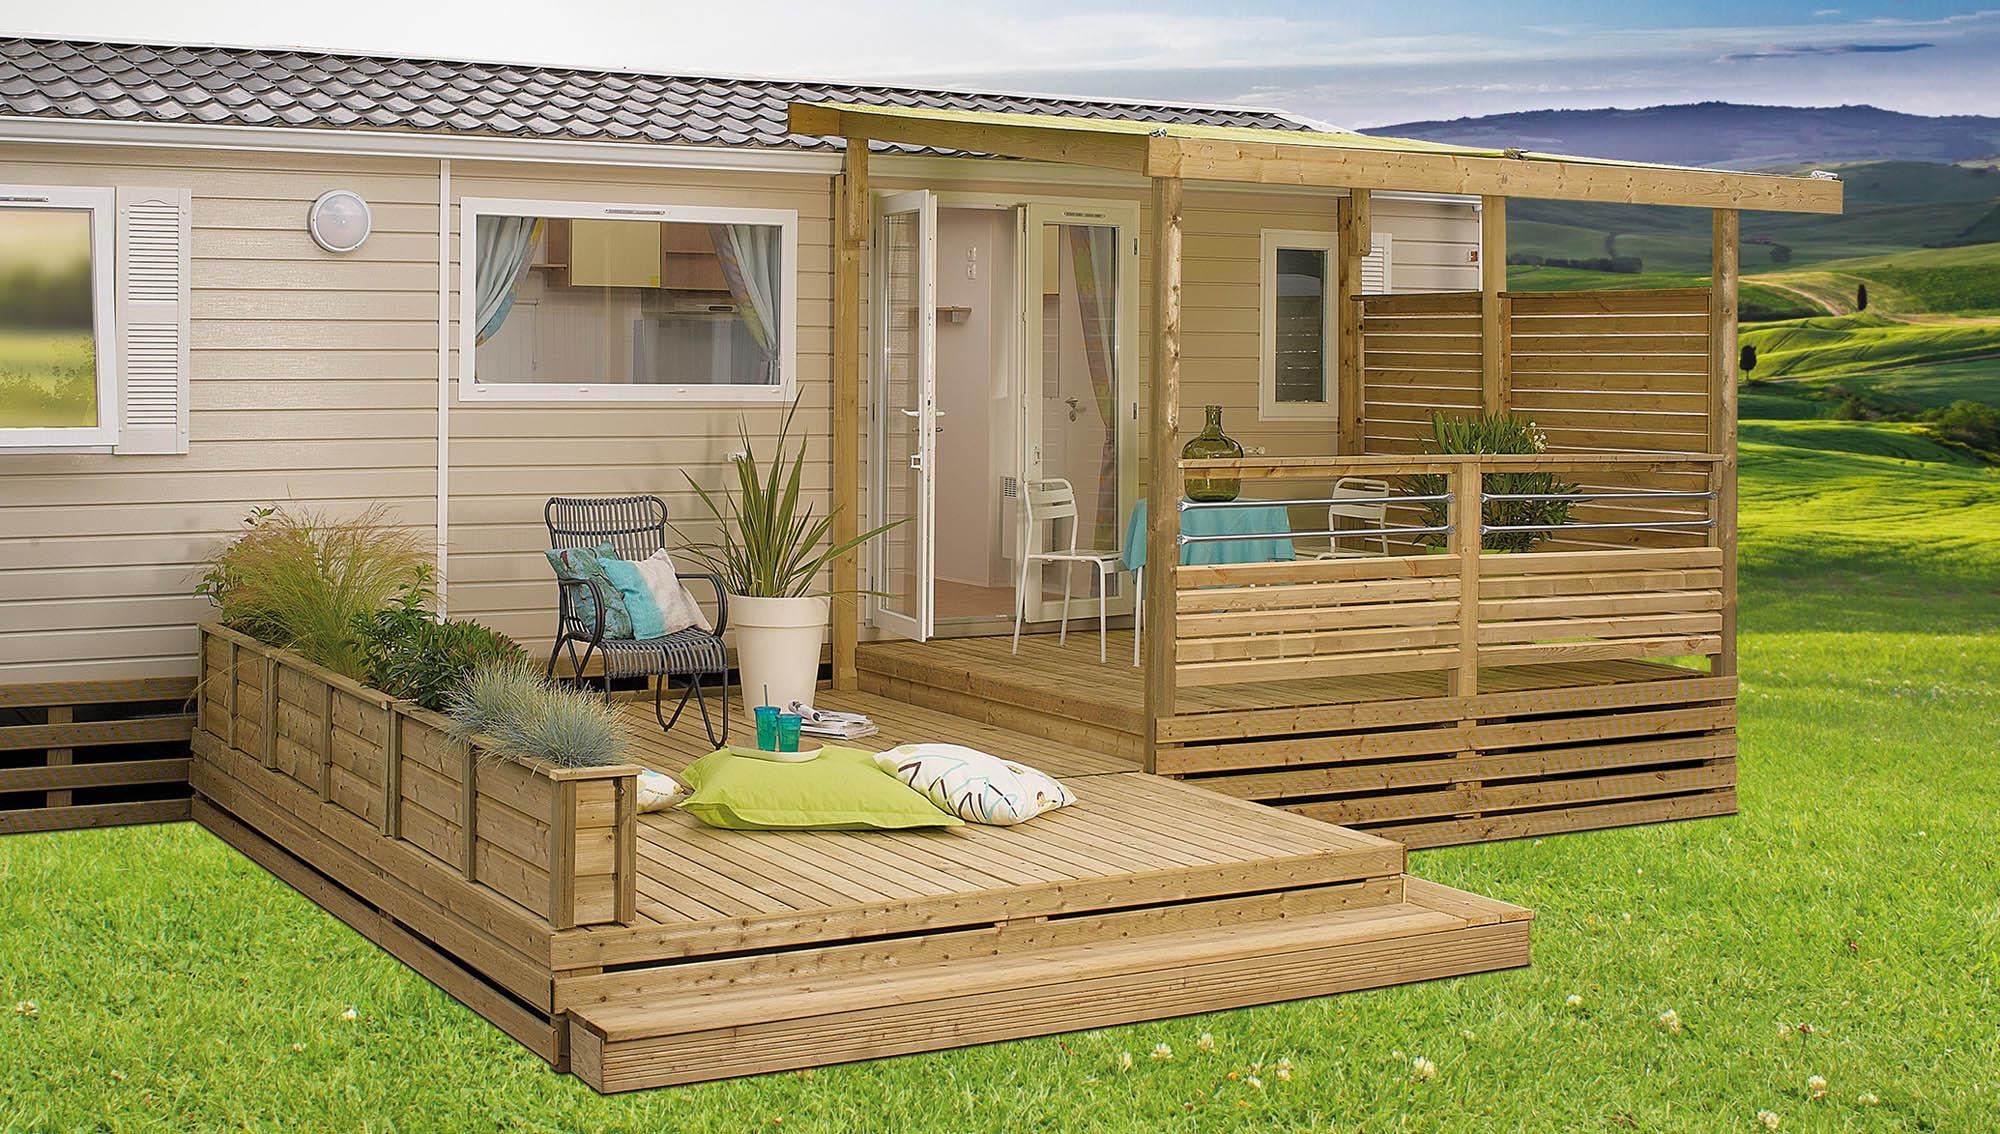 Terrasse Couverte Semi Couverte Terrasse En Bois Pour Mobil Home